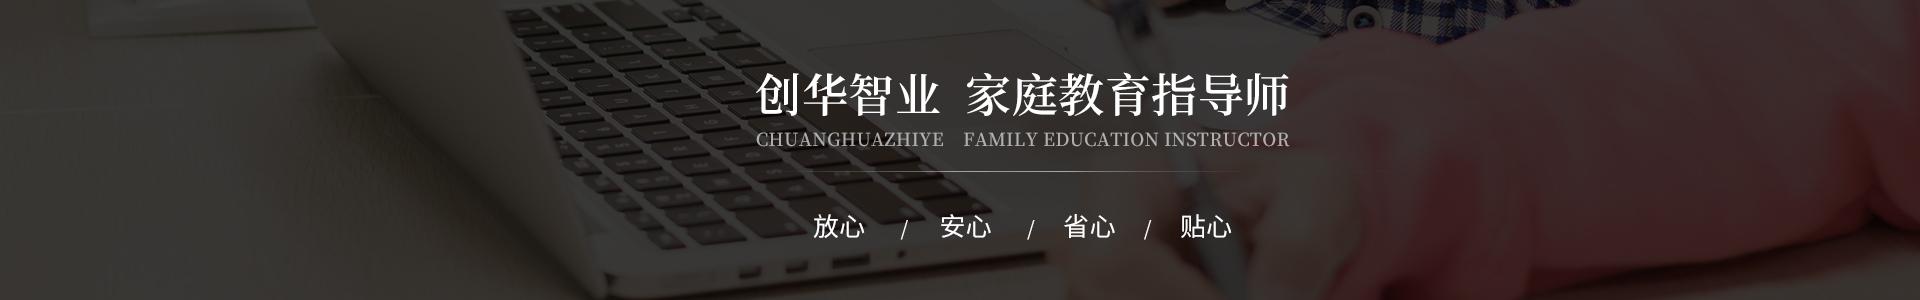 家庭教育指导师